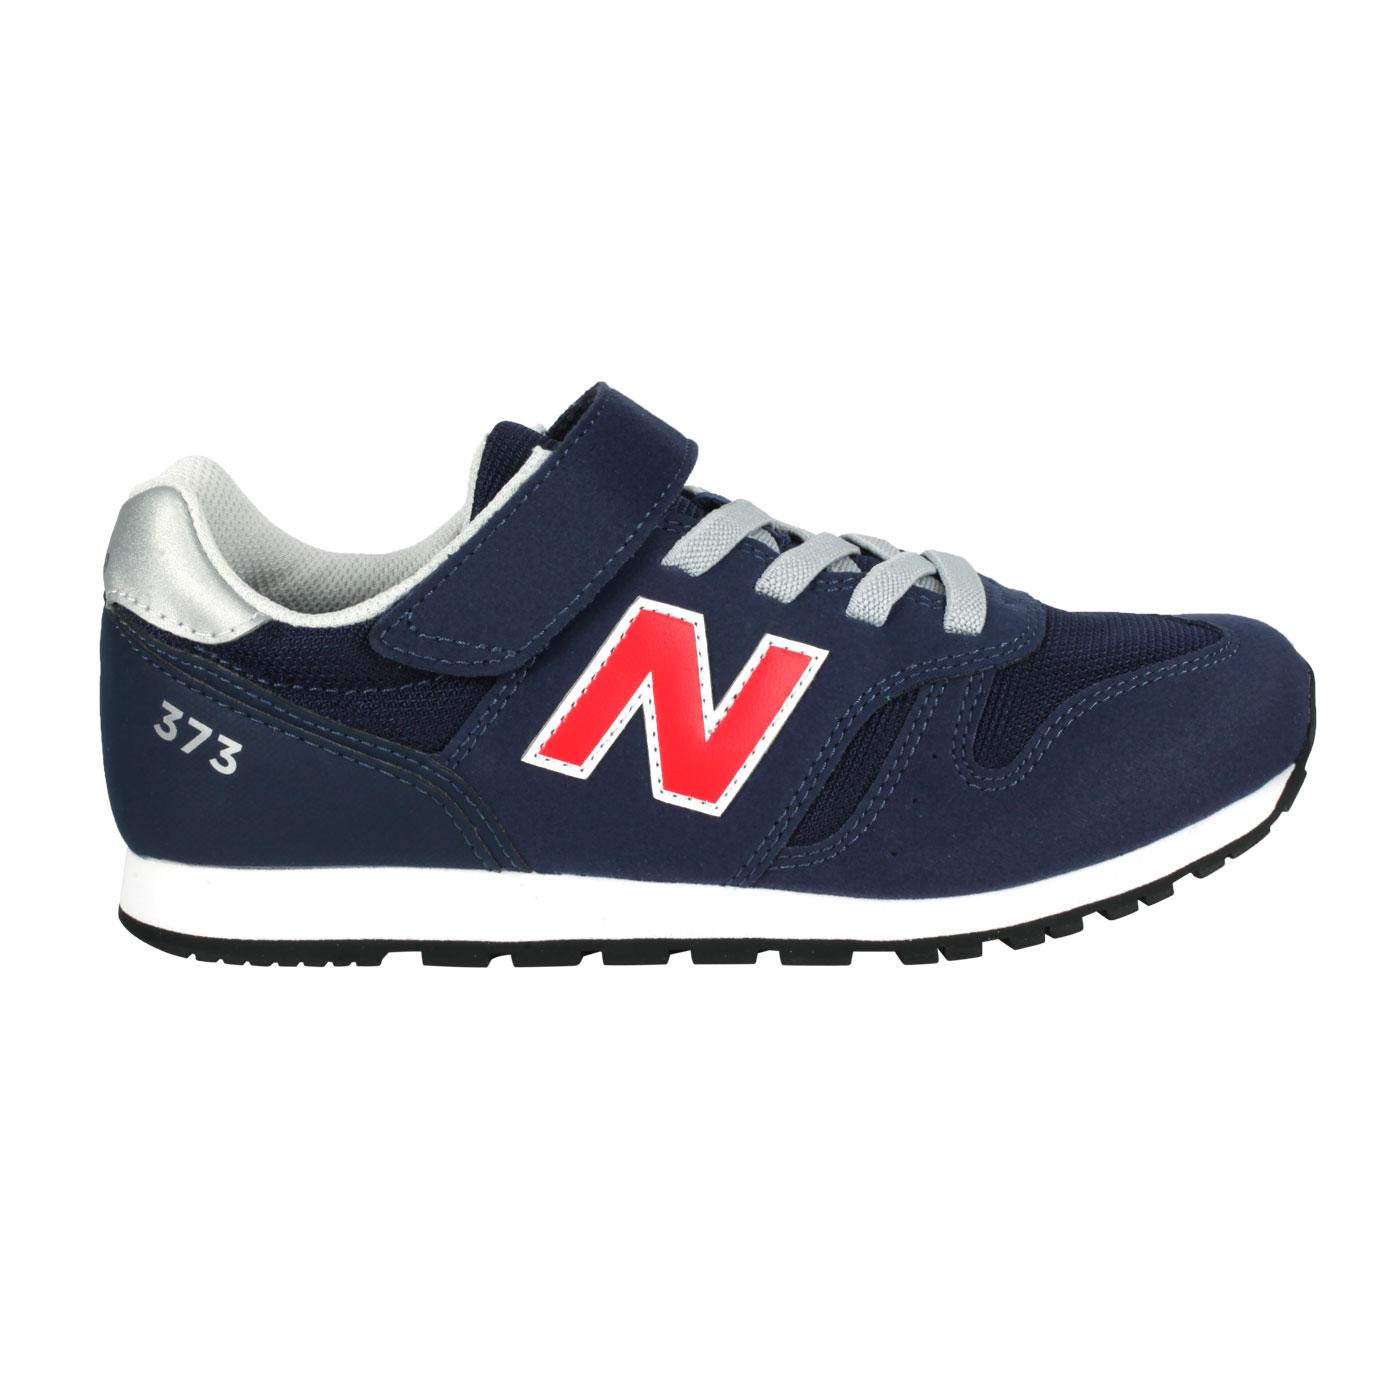 NEW BALANCE 中童休閒運動鞋-WIDE YV373CS2 - 深藍紅